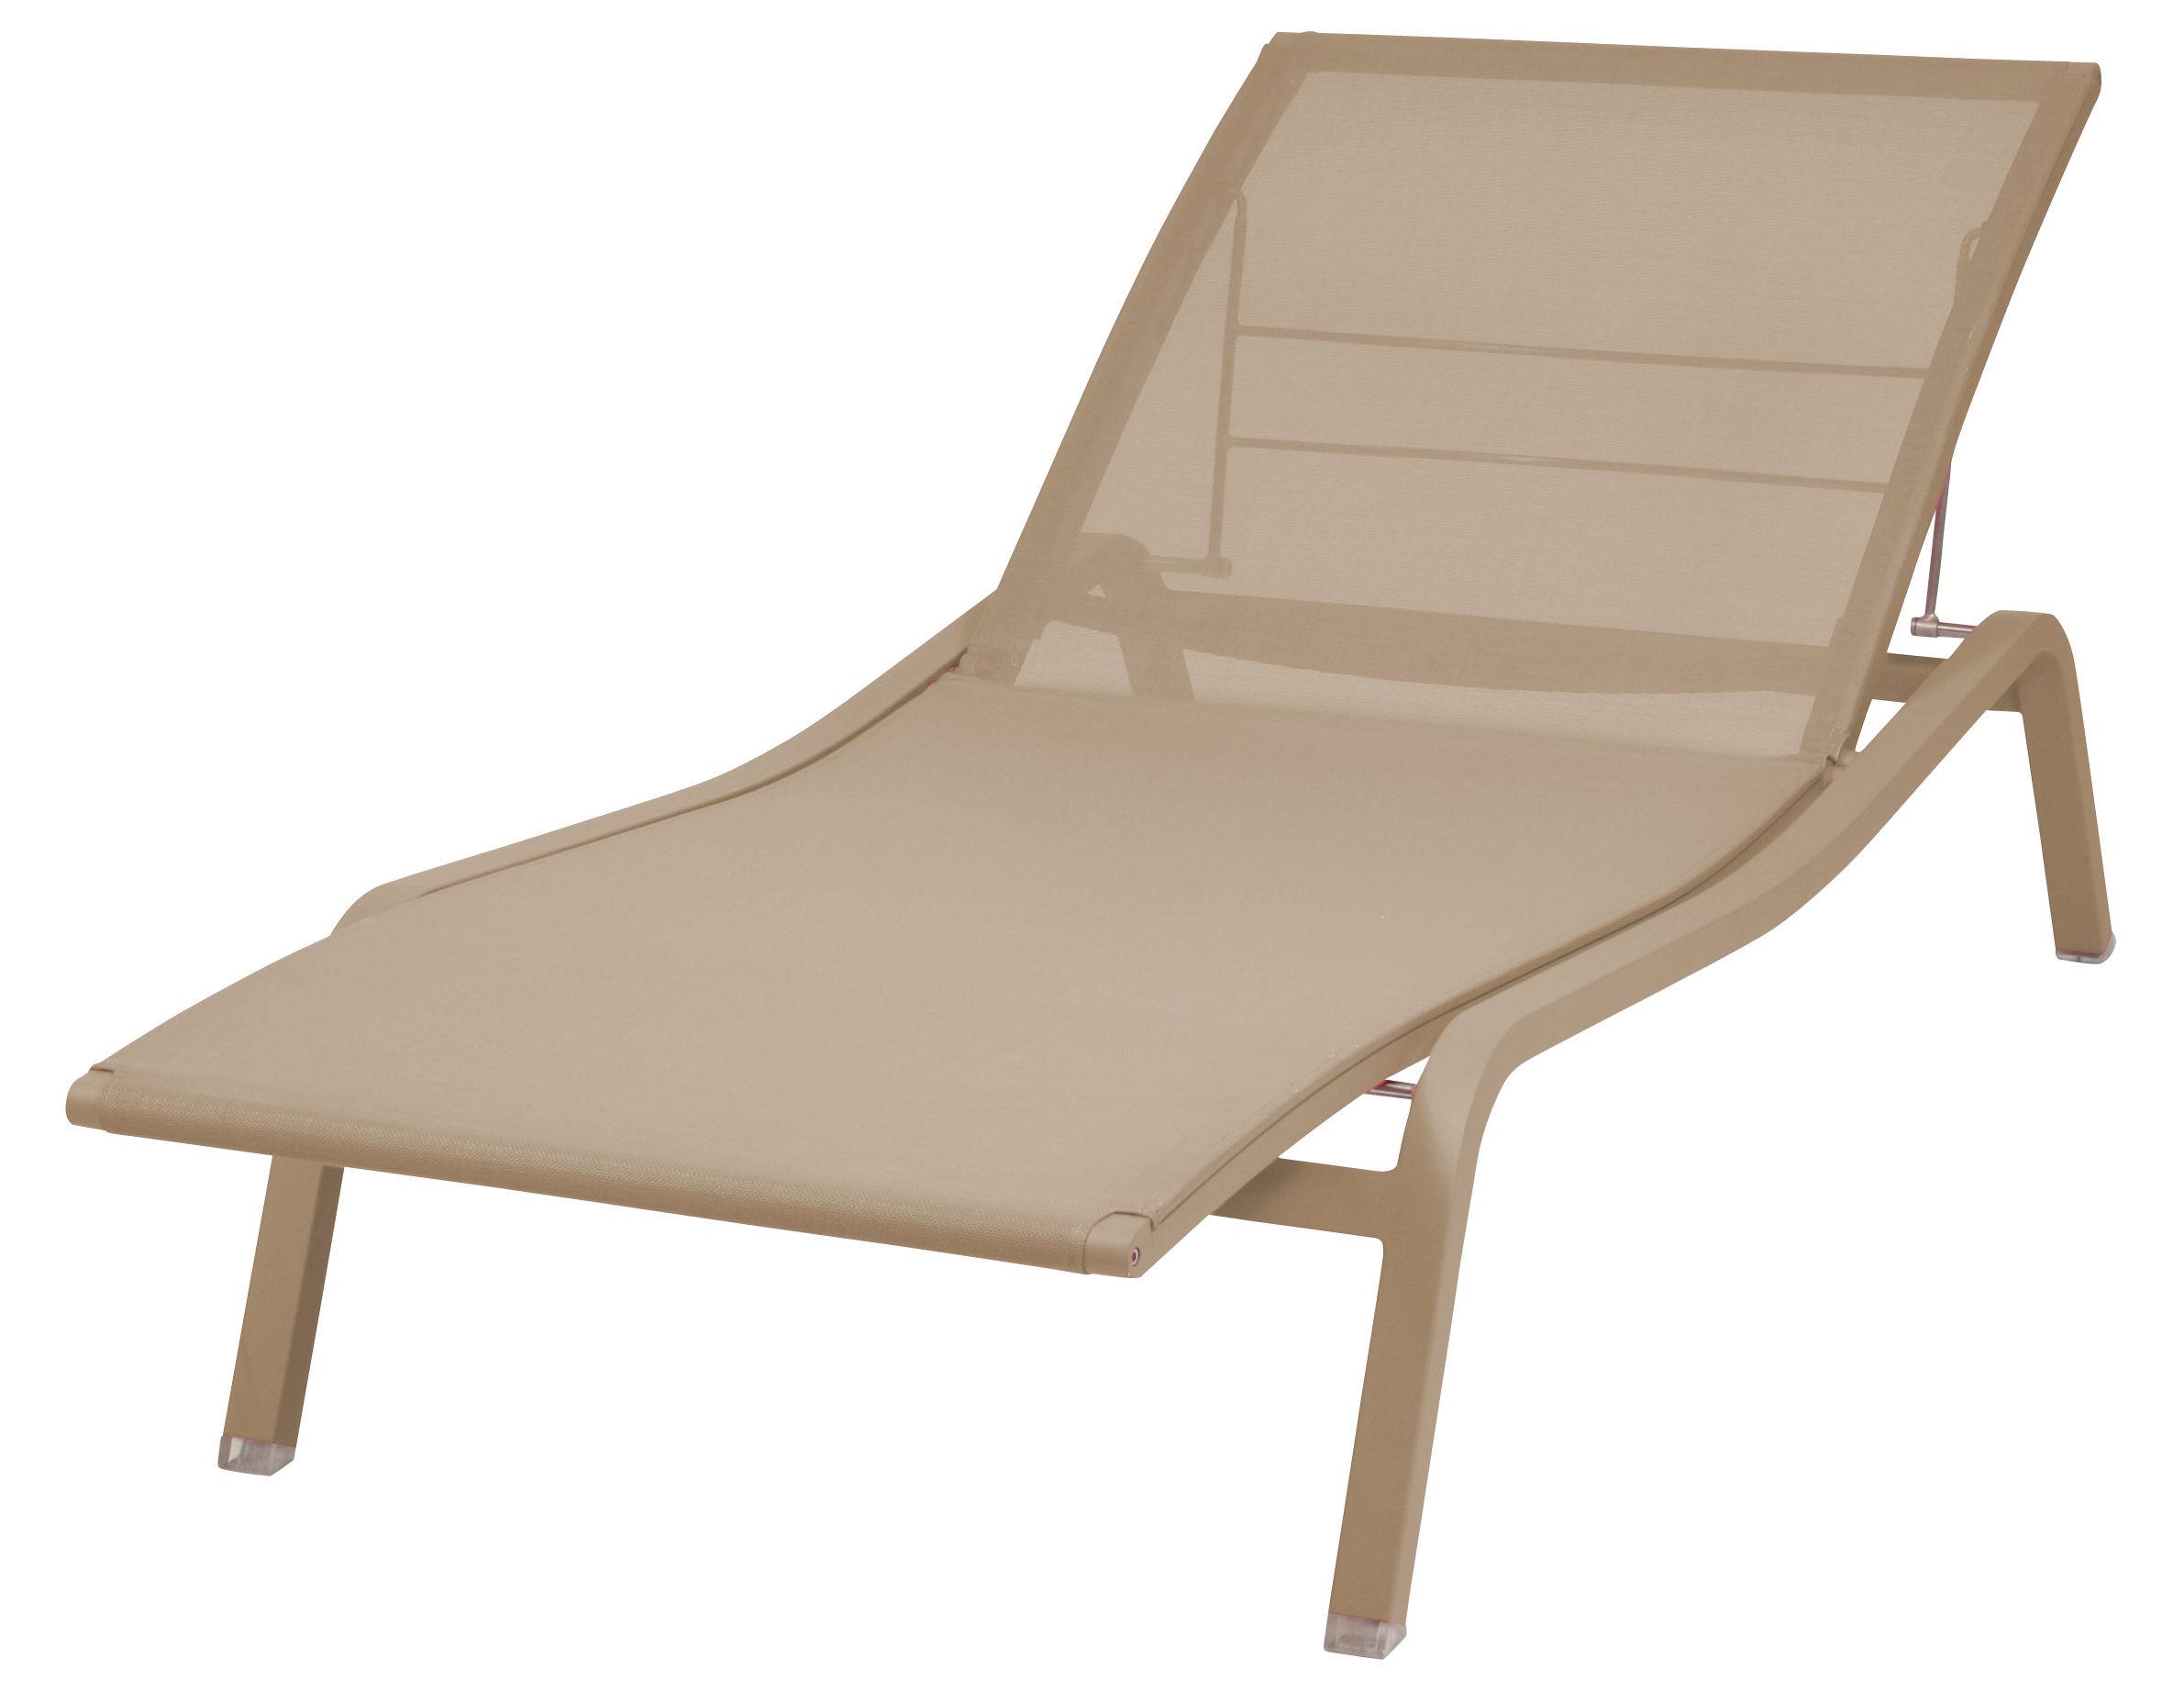 bain de soleil aliz larg 80 cm 3 positions muscade chin fermob. Black Bedroom Furniture Sets. Home Design Ideas